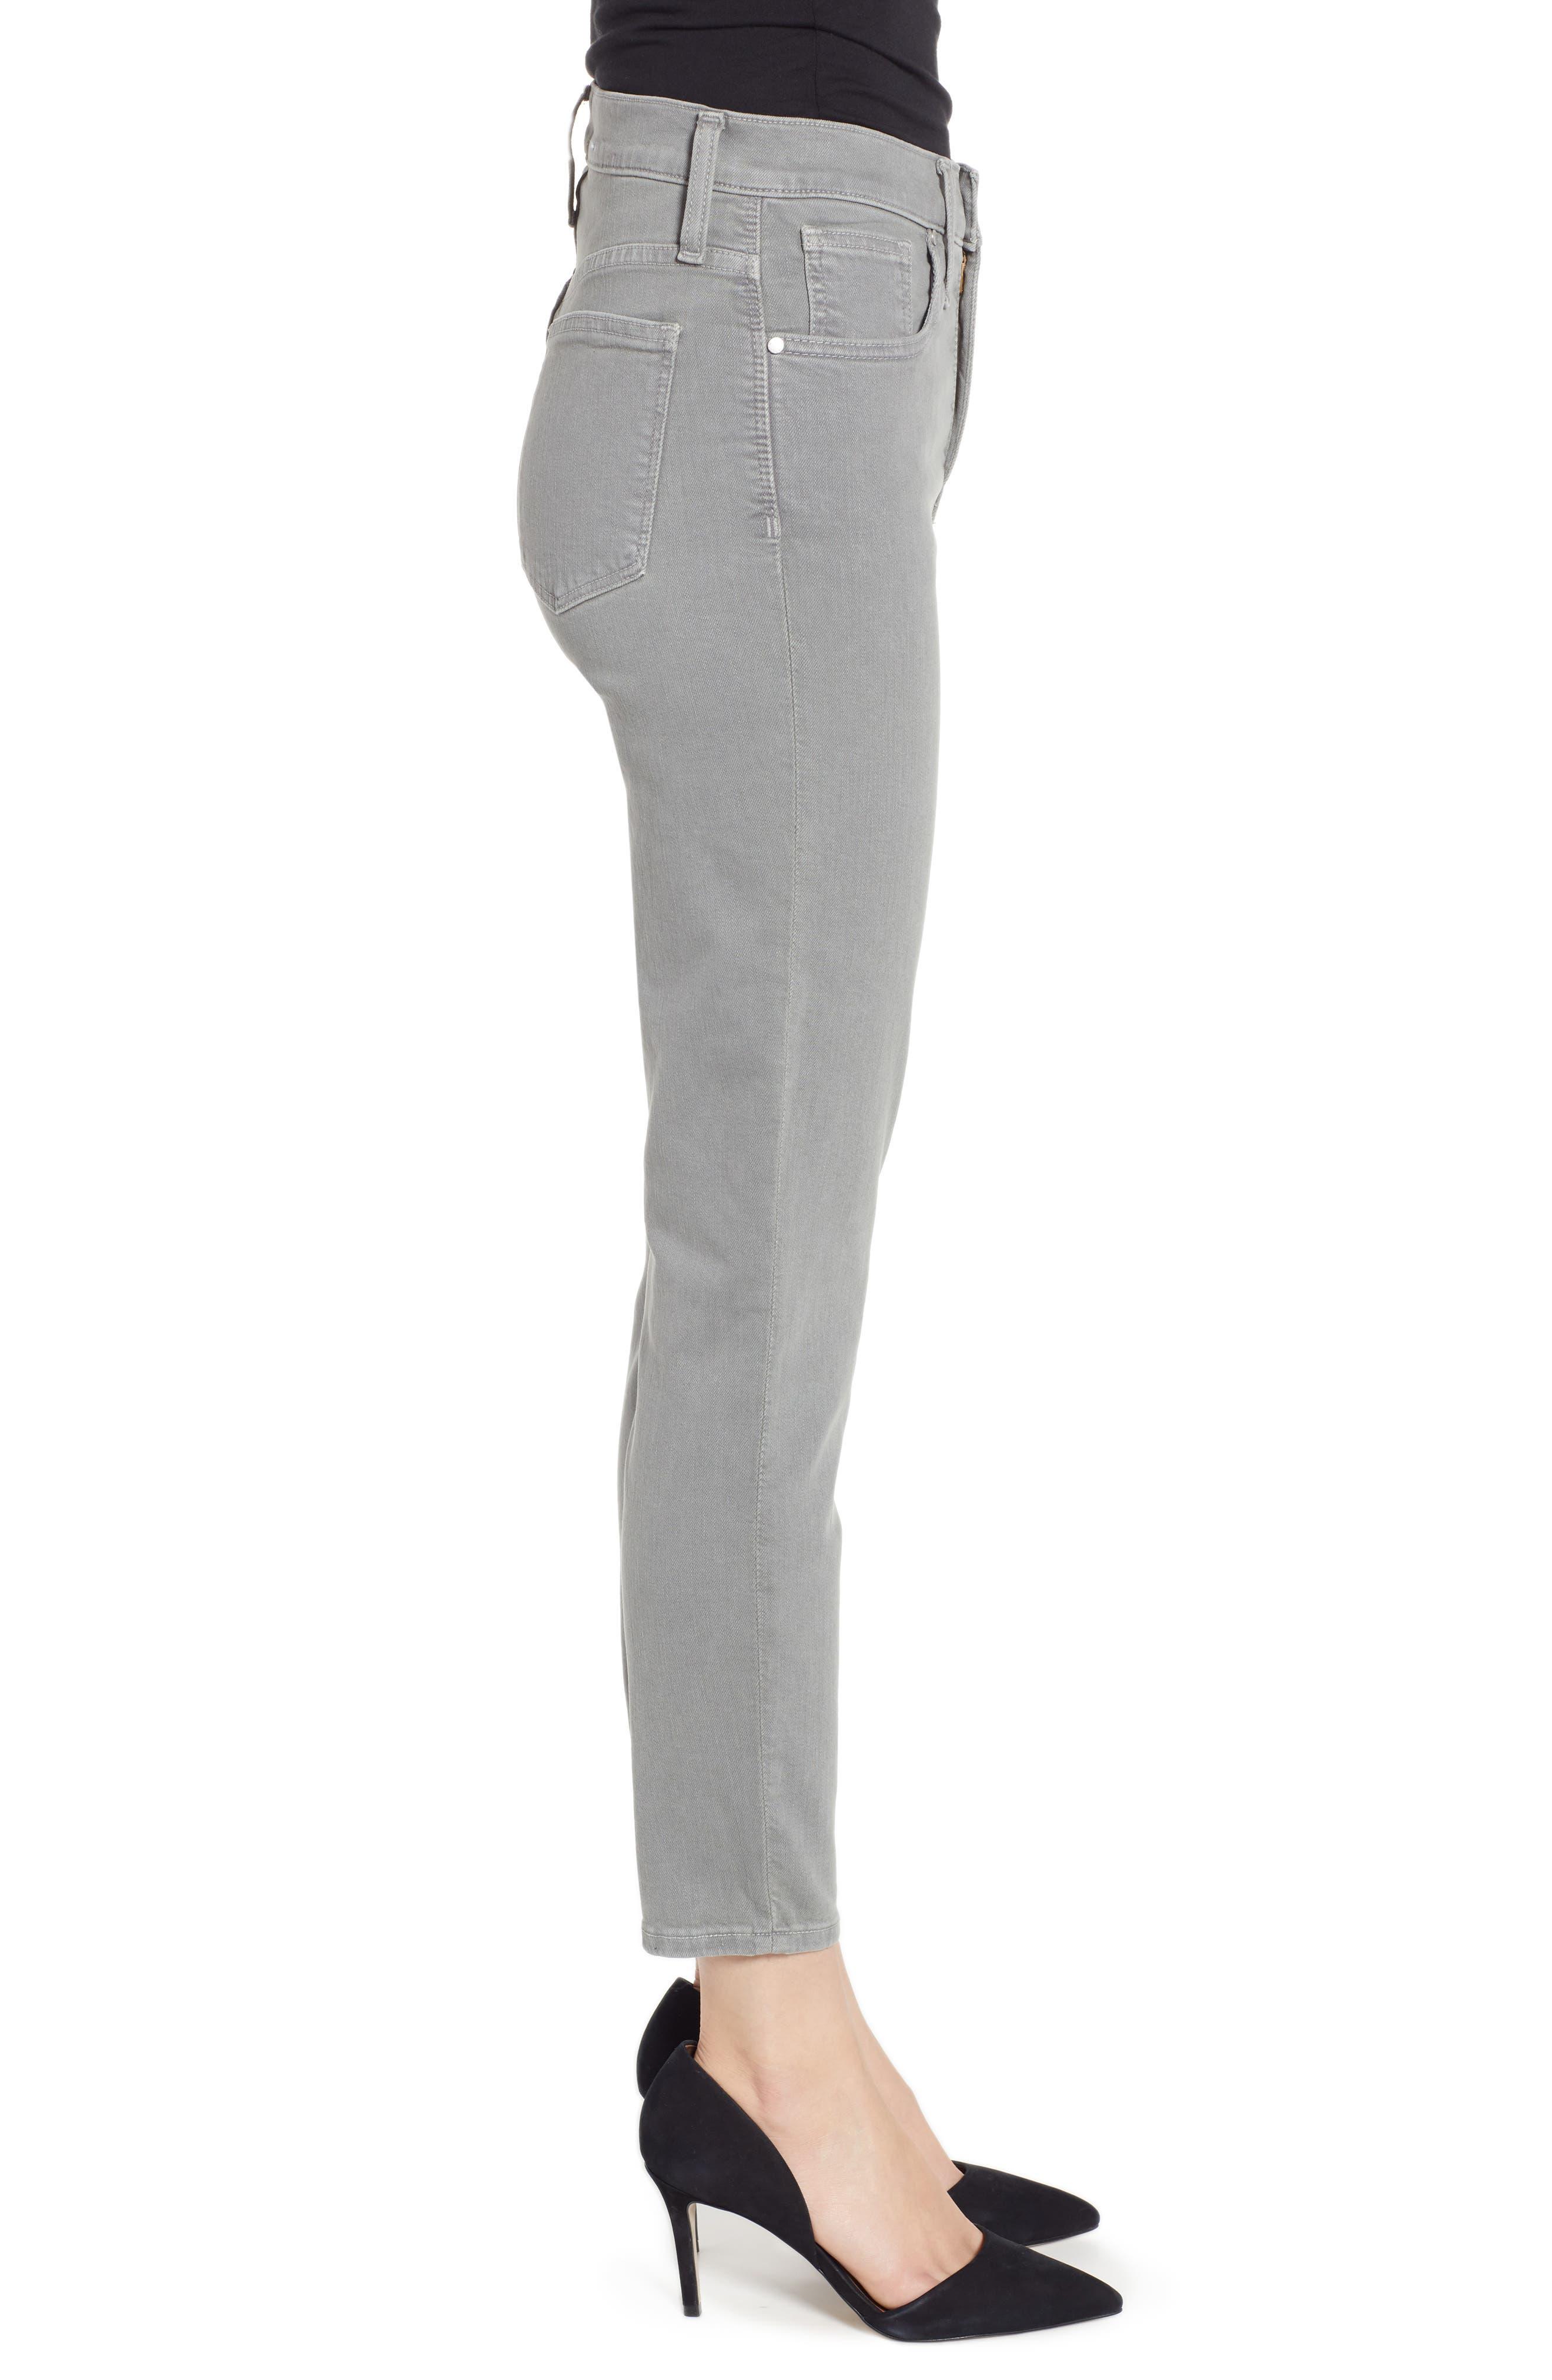 Sierra High Waist Ankle Skinny Pants,                             Alternate thumbnail 3, color,                             GREY